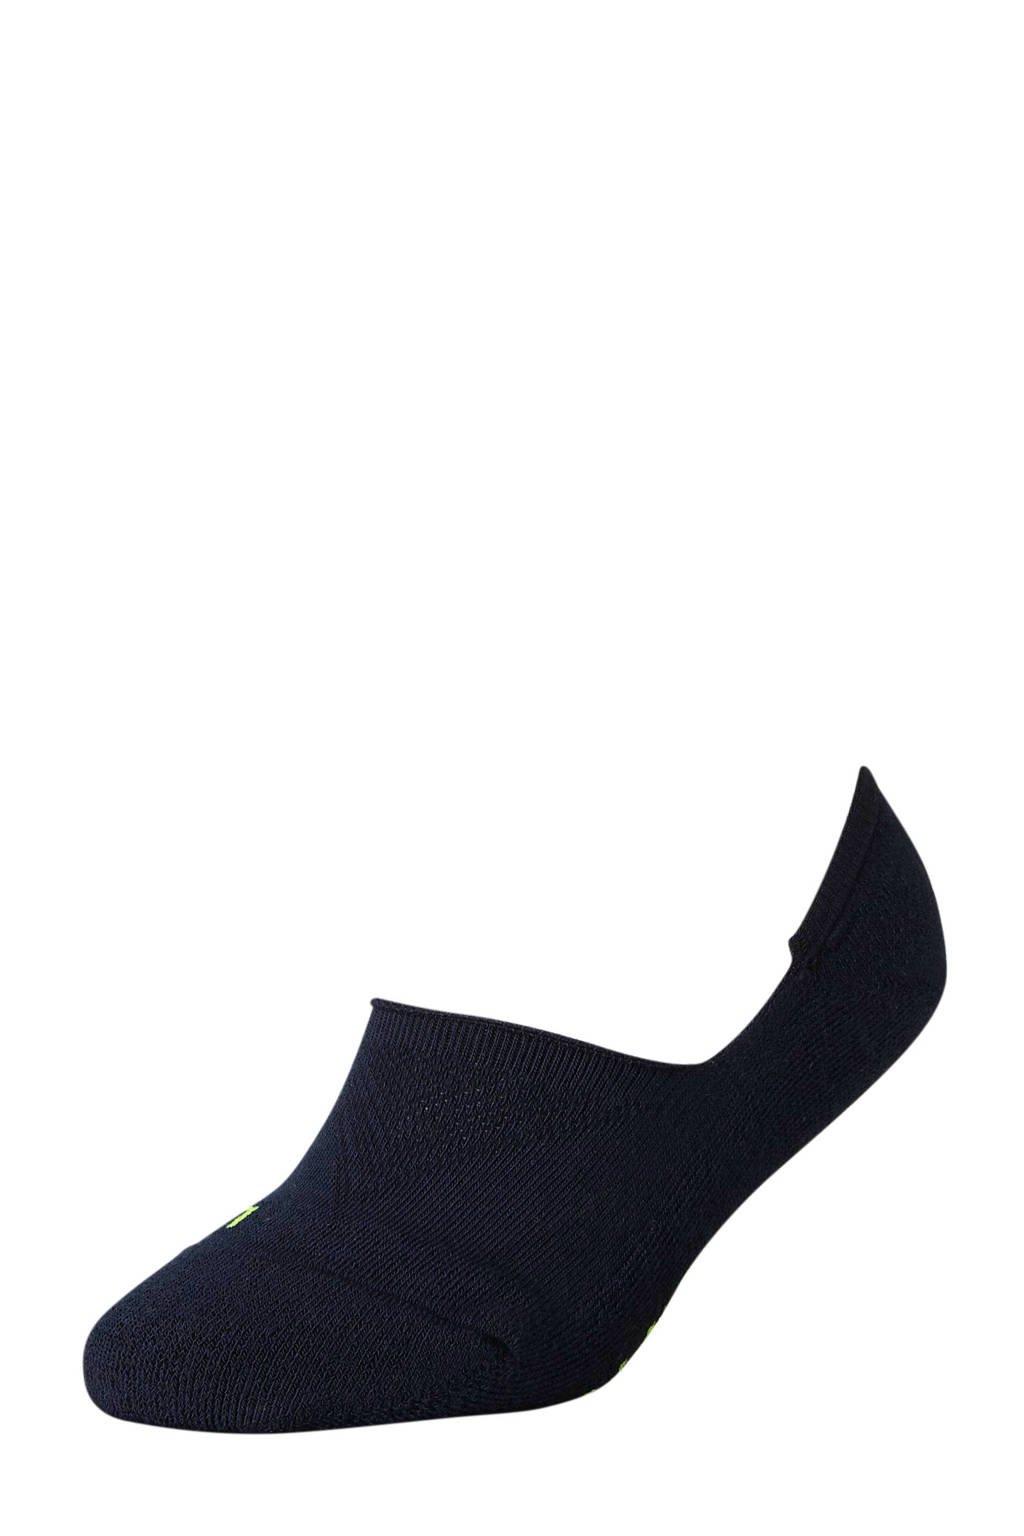 FALKE Cool Kick Invisible sneakersokken donkerblauw, Marine